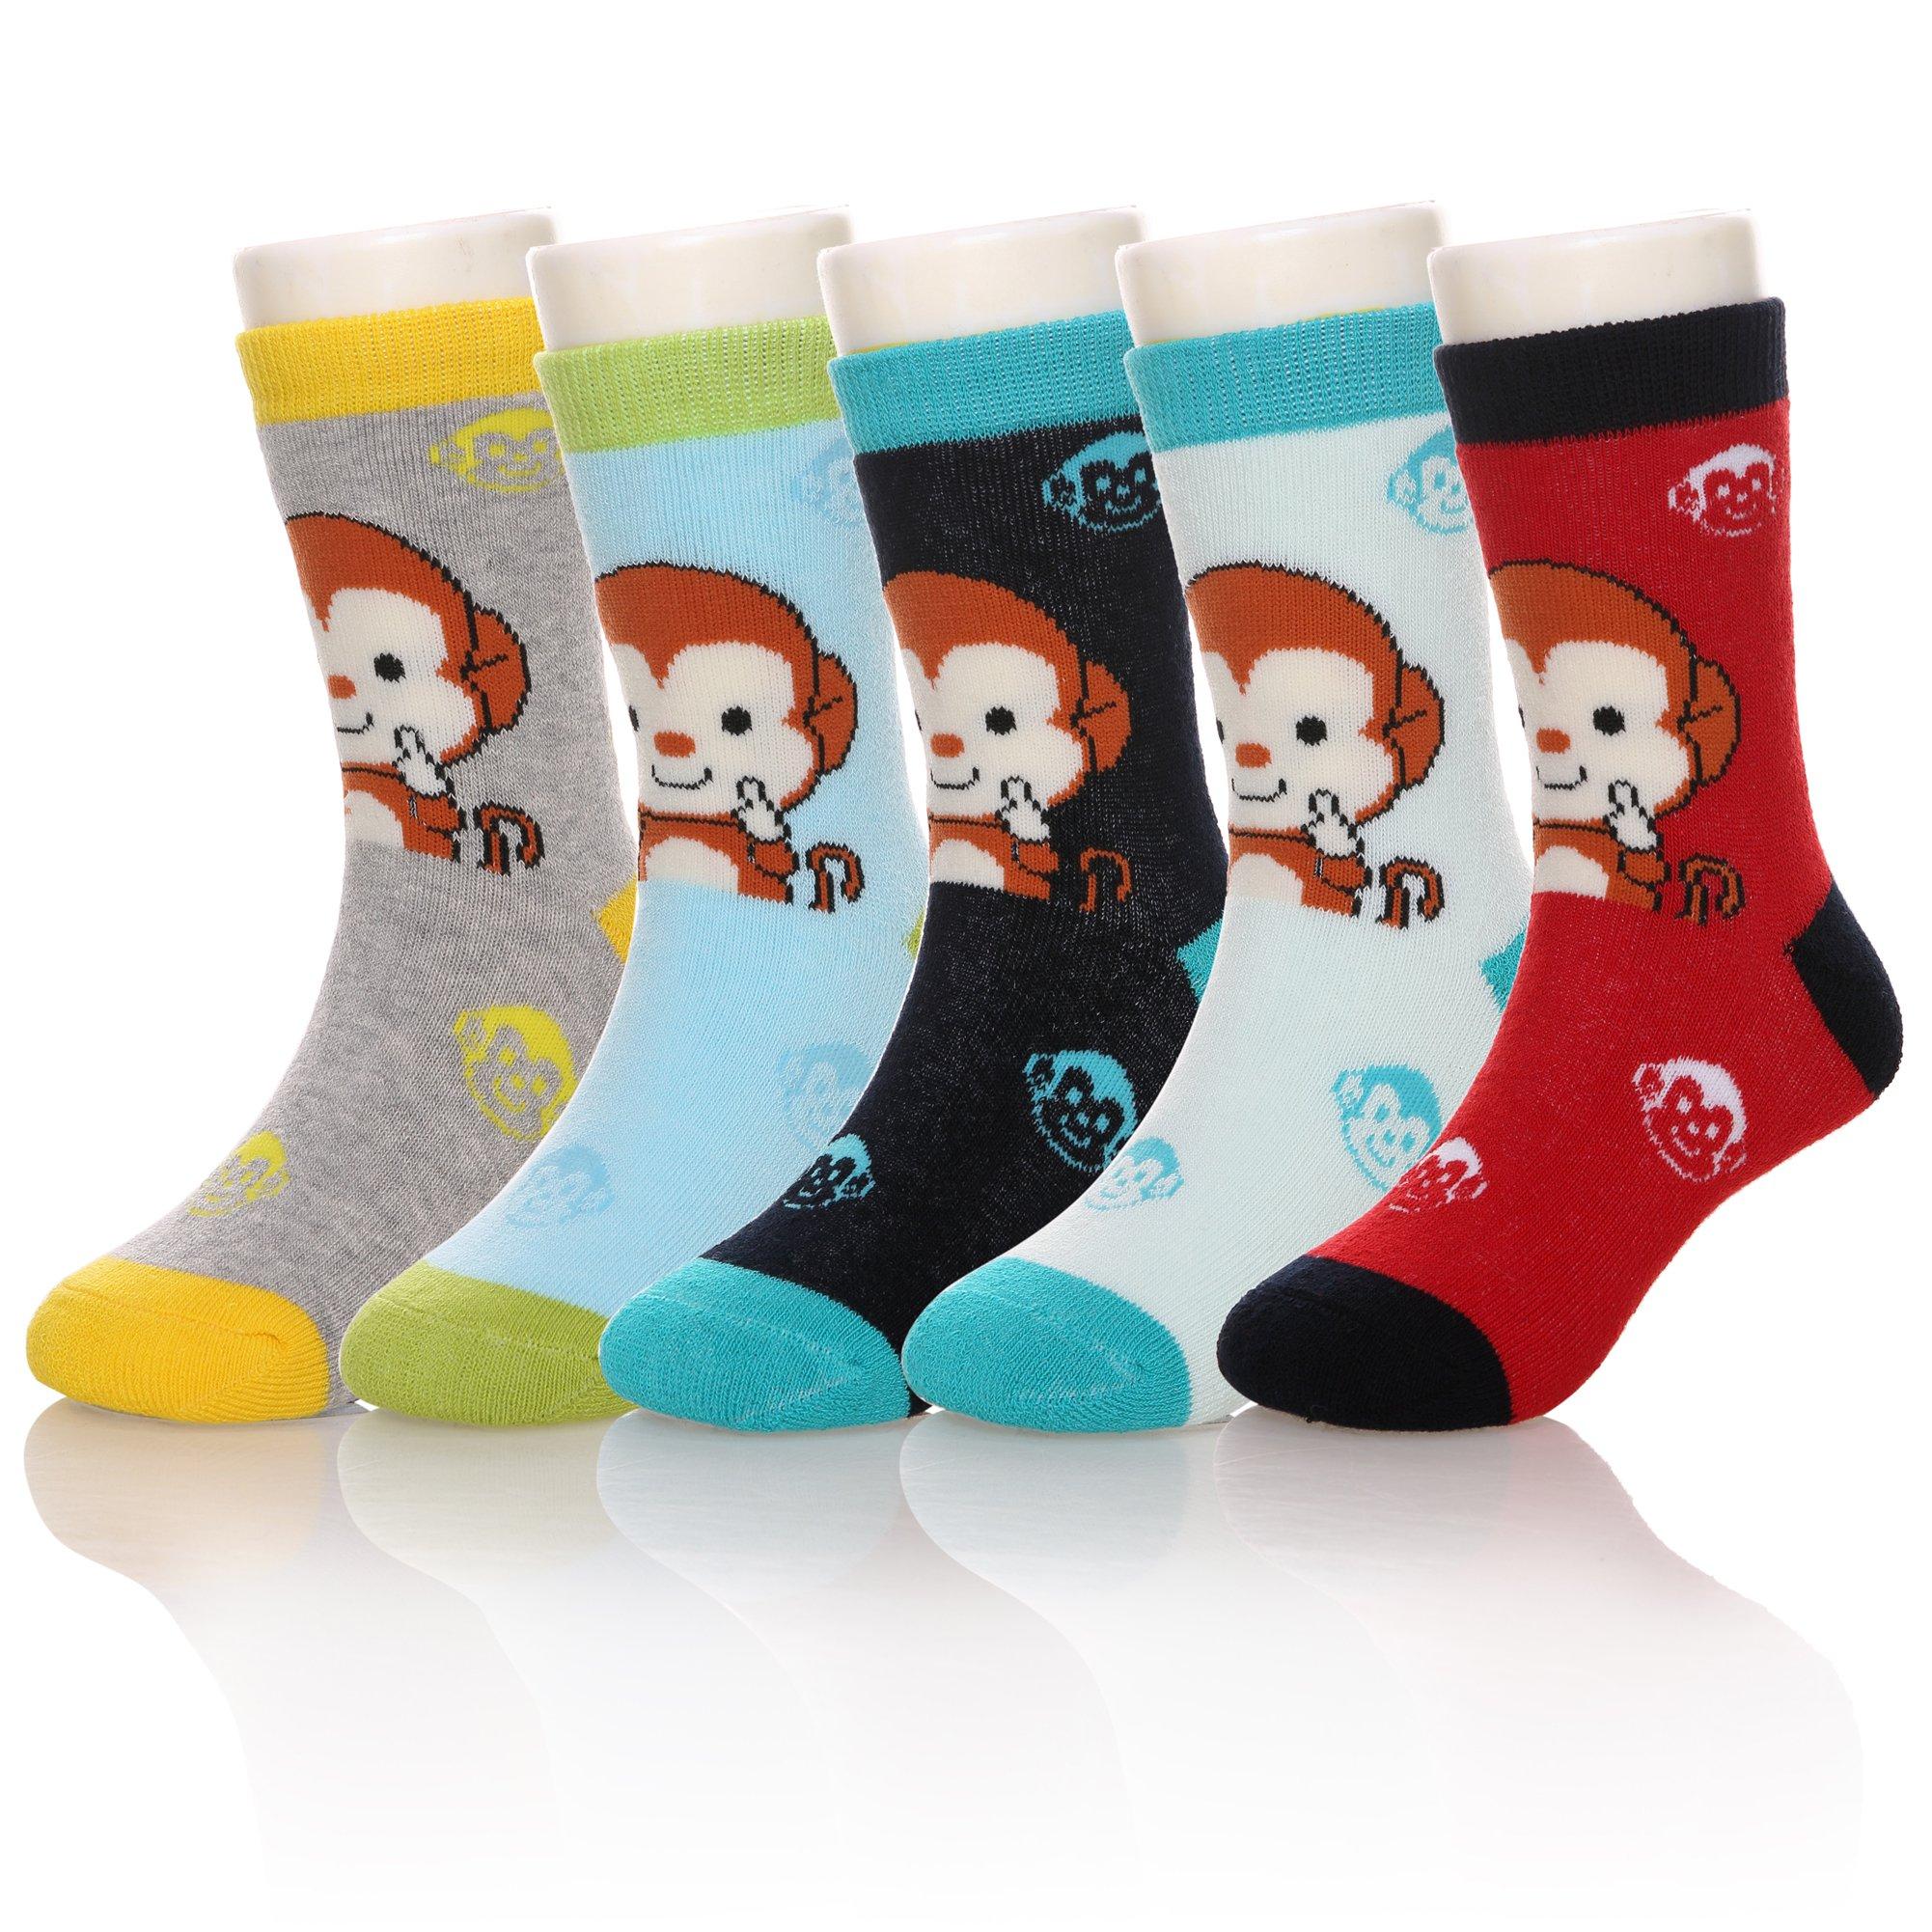 Eocom 5 Pairs Children's Winter Warm Cotton Socks Novelty Kids Boys Girls Socks (6-8 Years, Monkey)